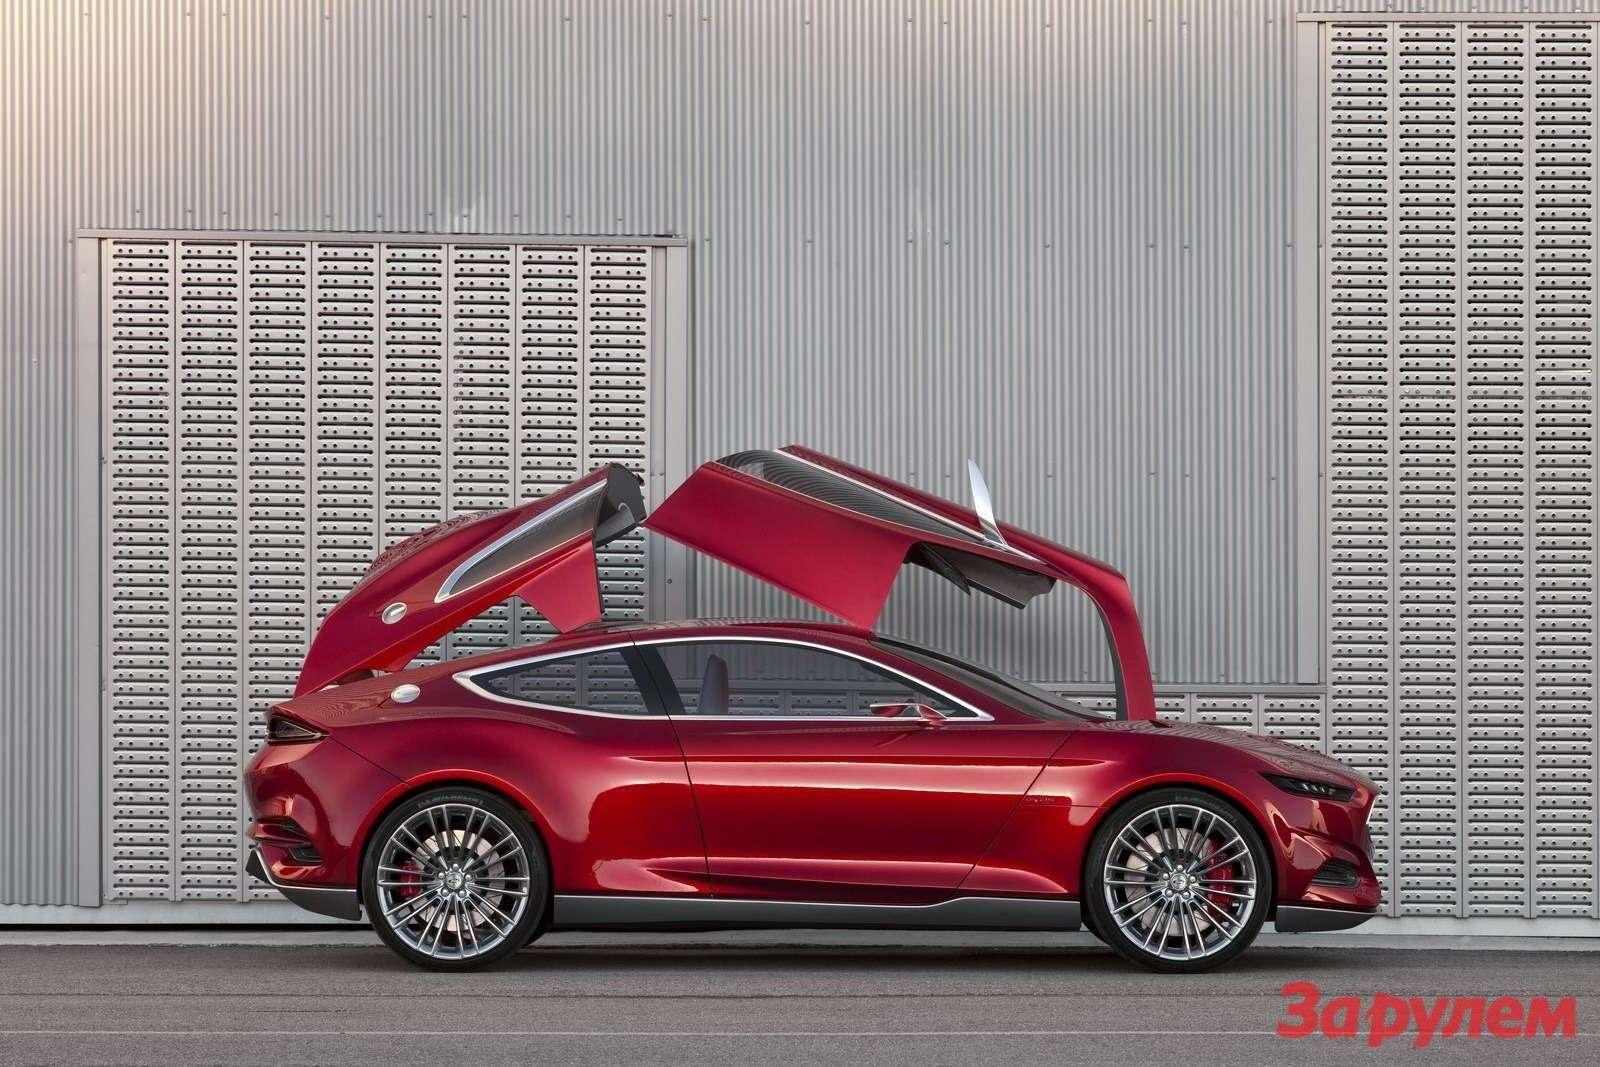 Ford-EVOS-Concpet-72